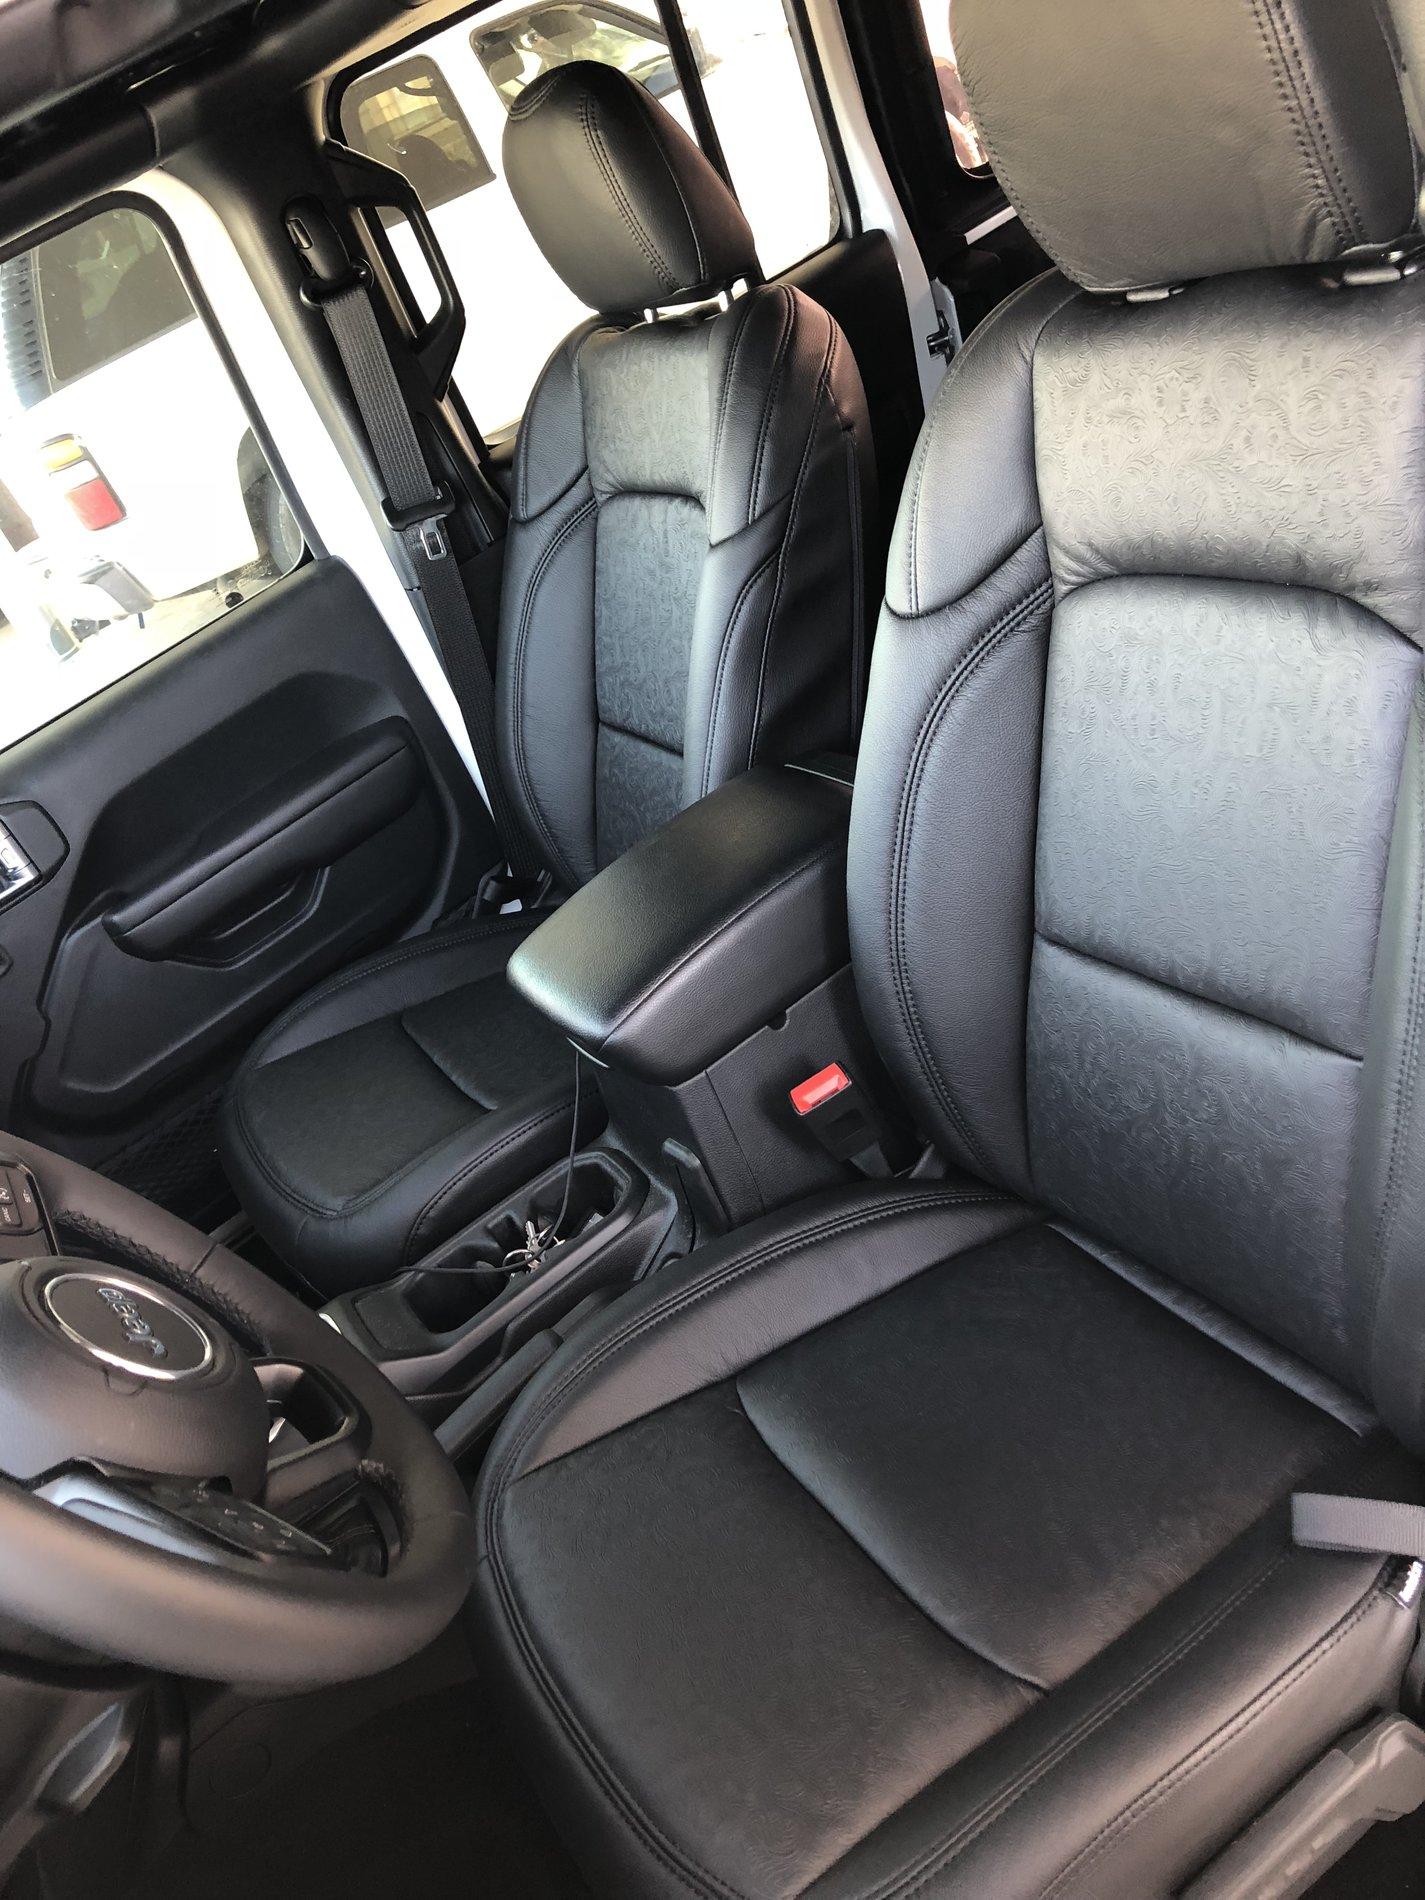 Katzkin Leather For JL Wrangler Page 2 2018 Jeep